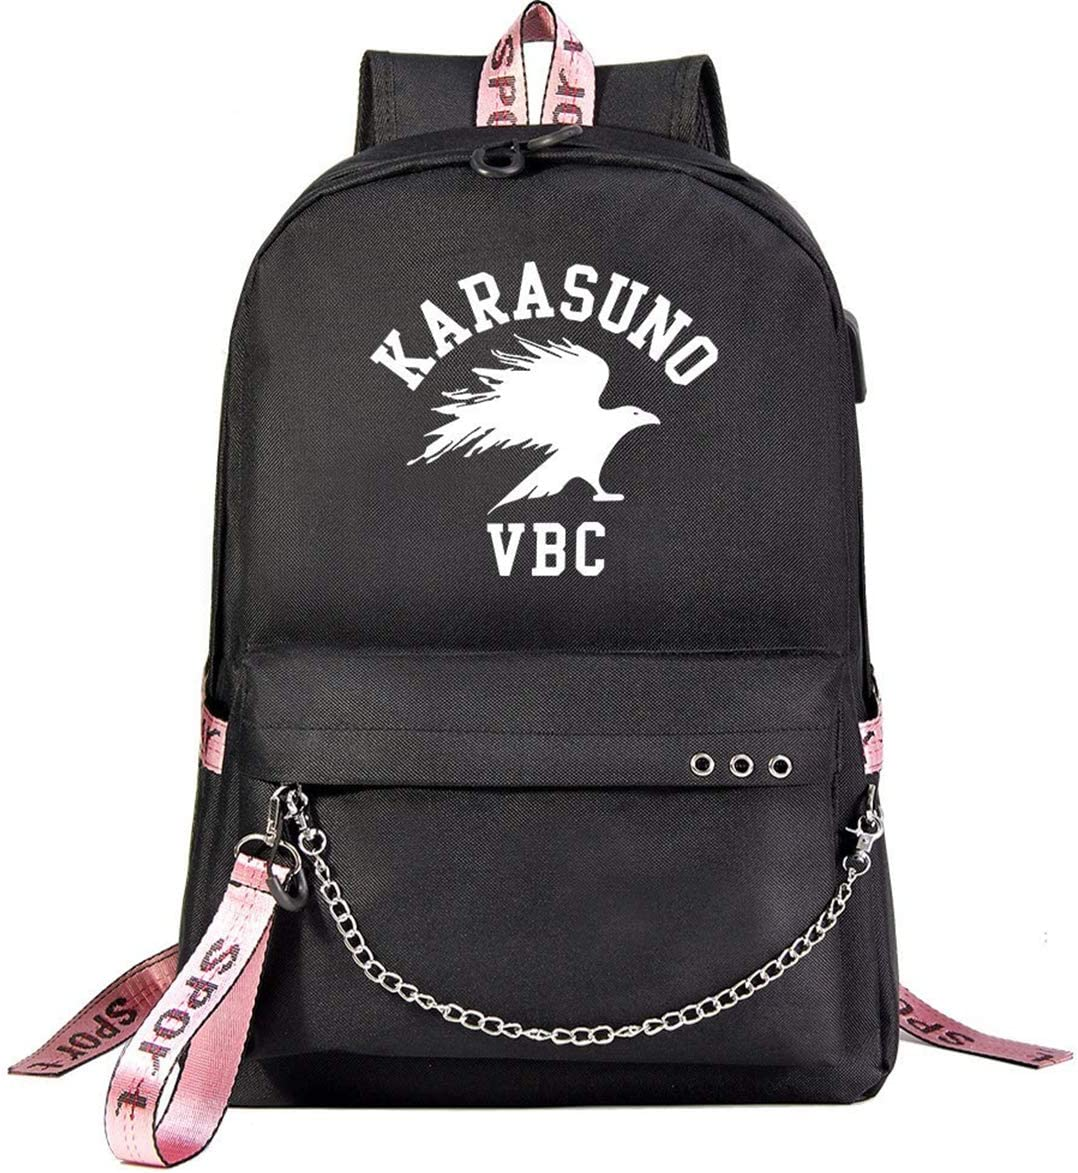 KY KEYOLET Kpop Haikyuu Backpack Karasuno Daypack Laptop School Bag Anime Fans Support Cosplay Merchandise